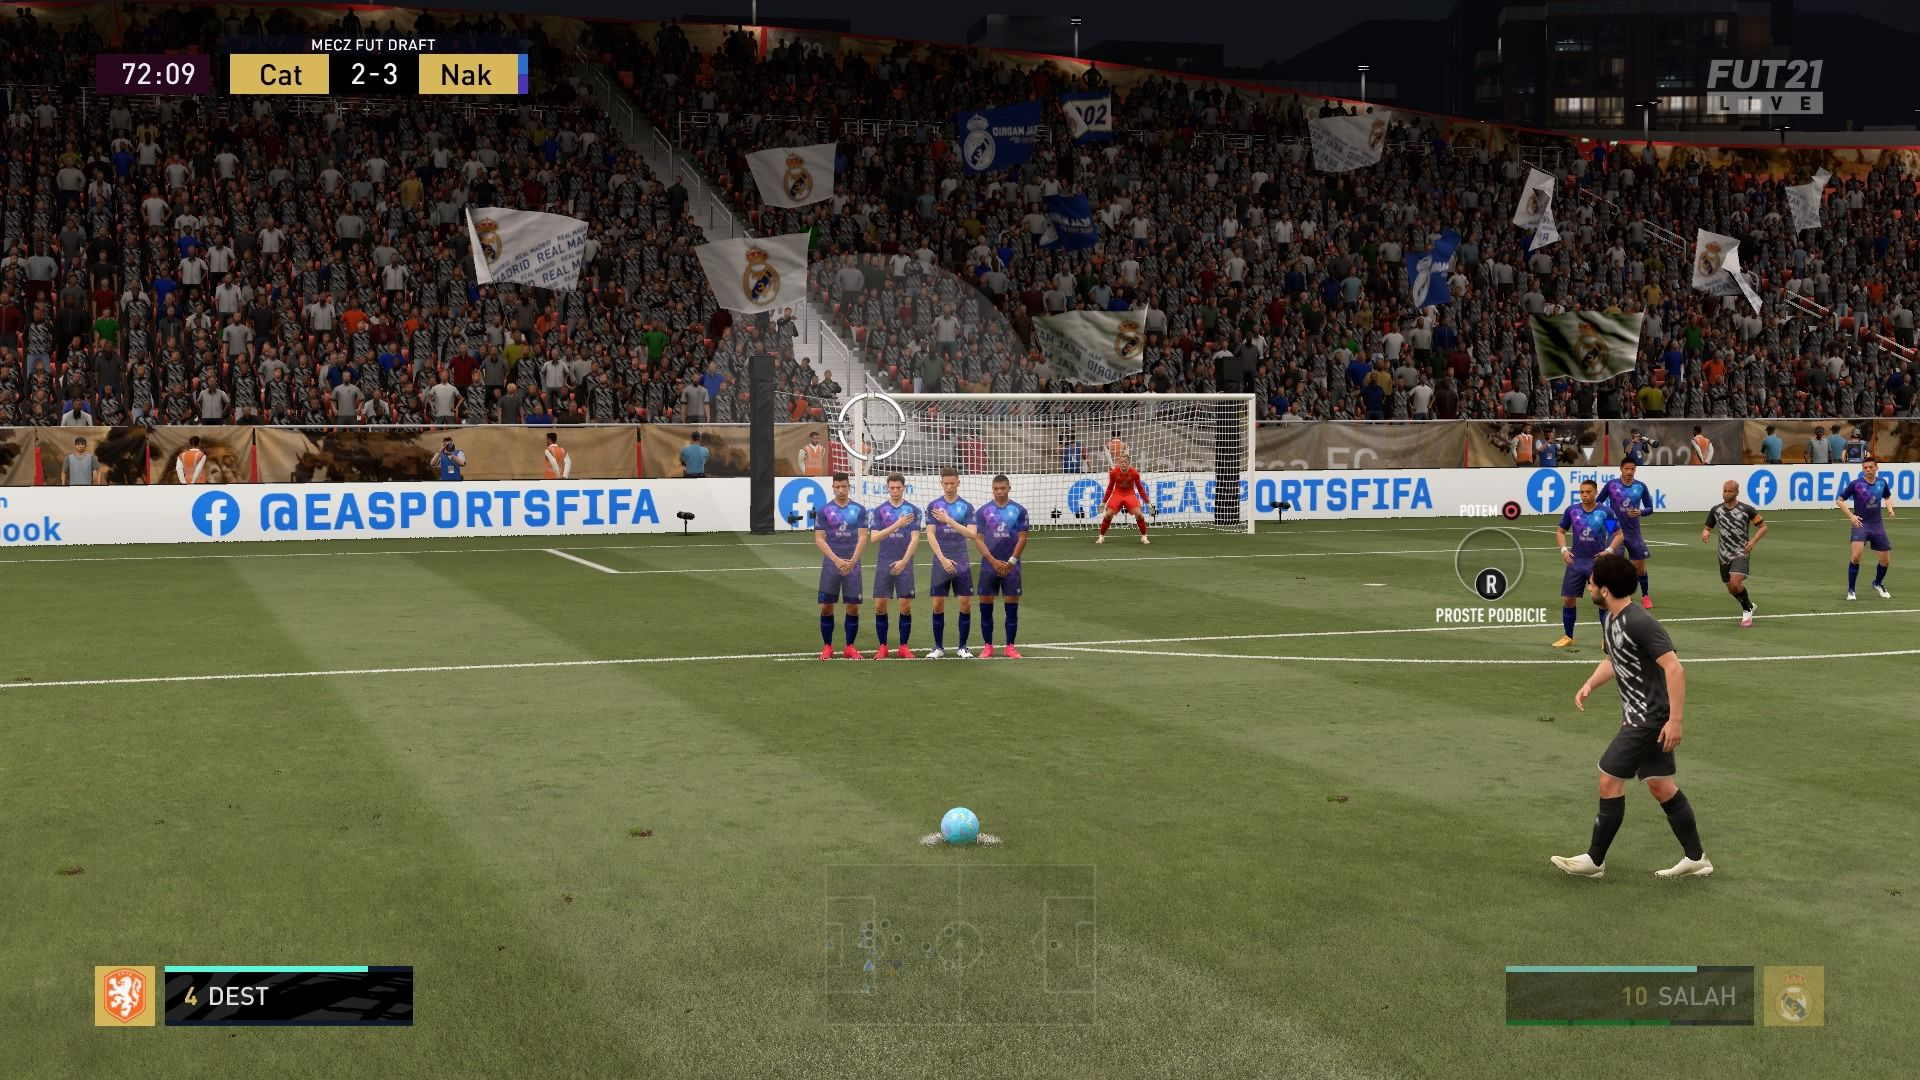 FIFA_21_recenzja_30_